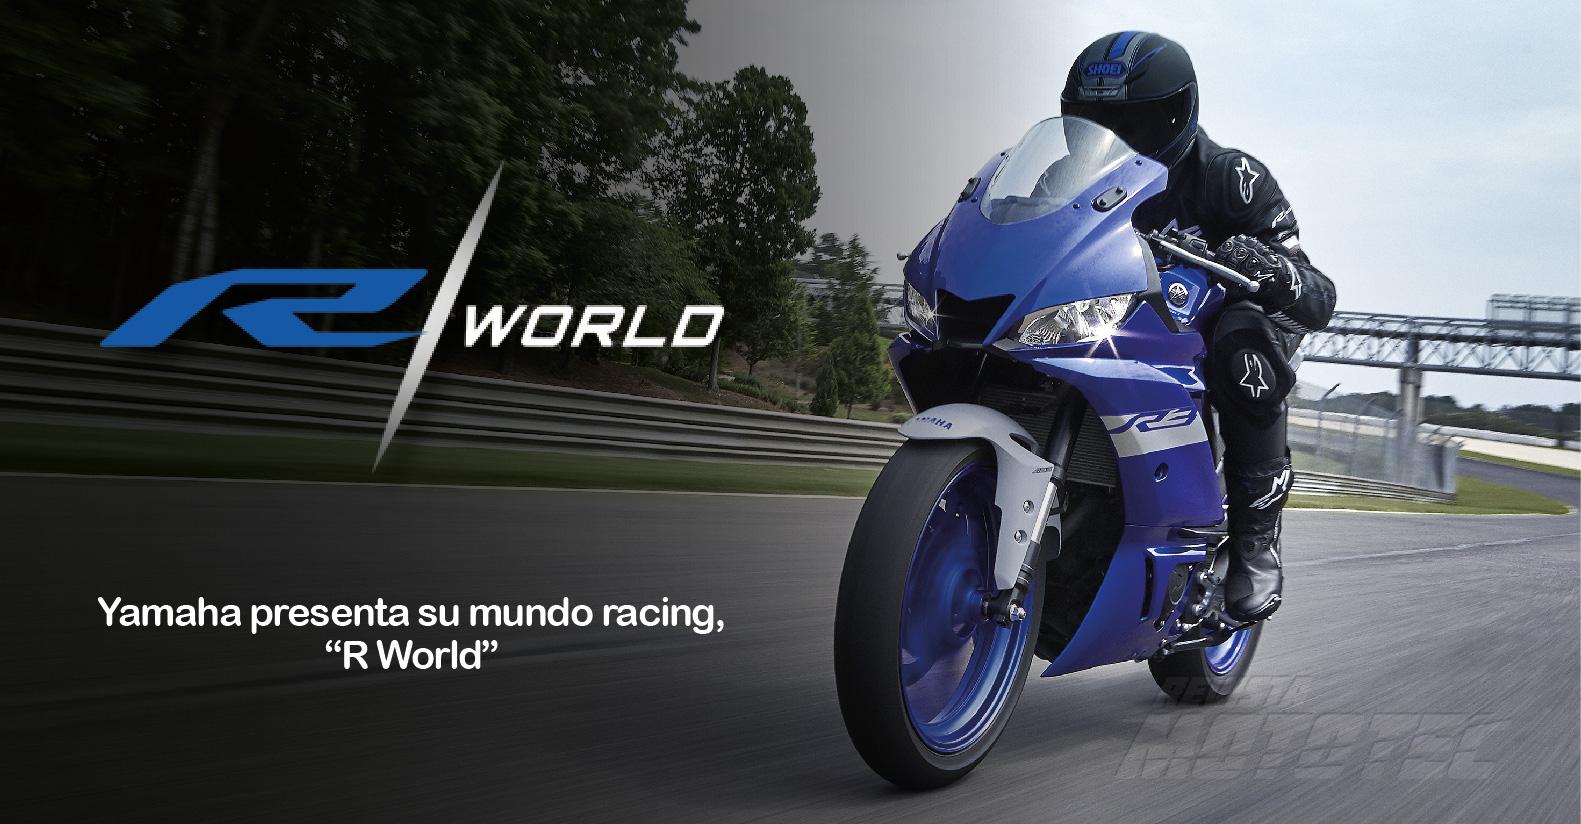 yamaha-racing-r-world-mundo-06